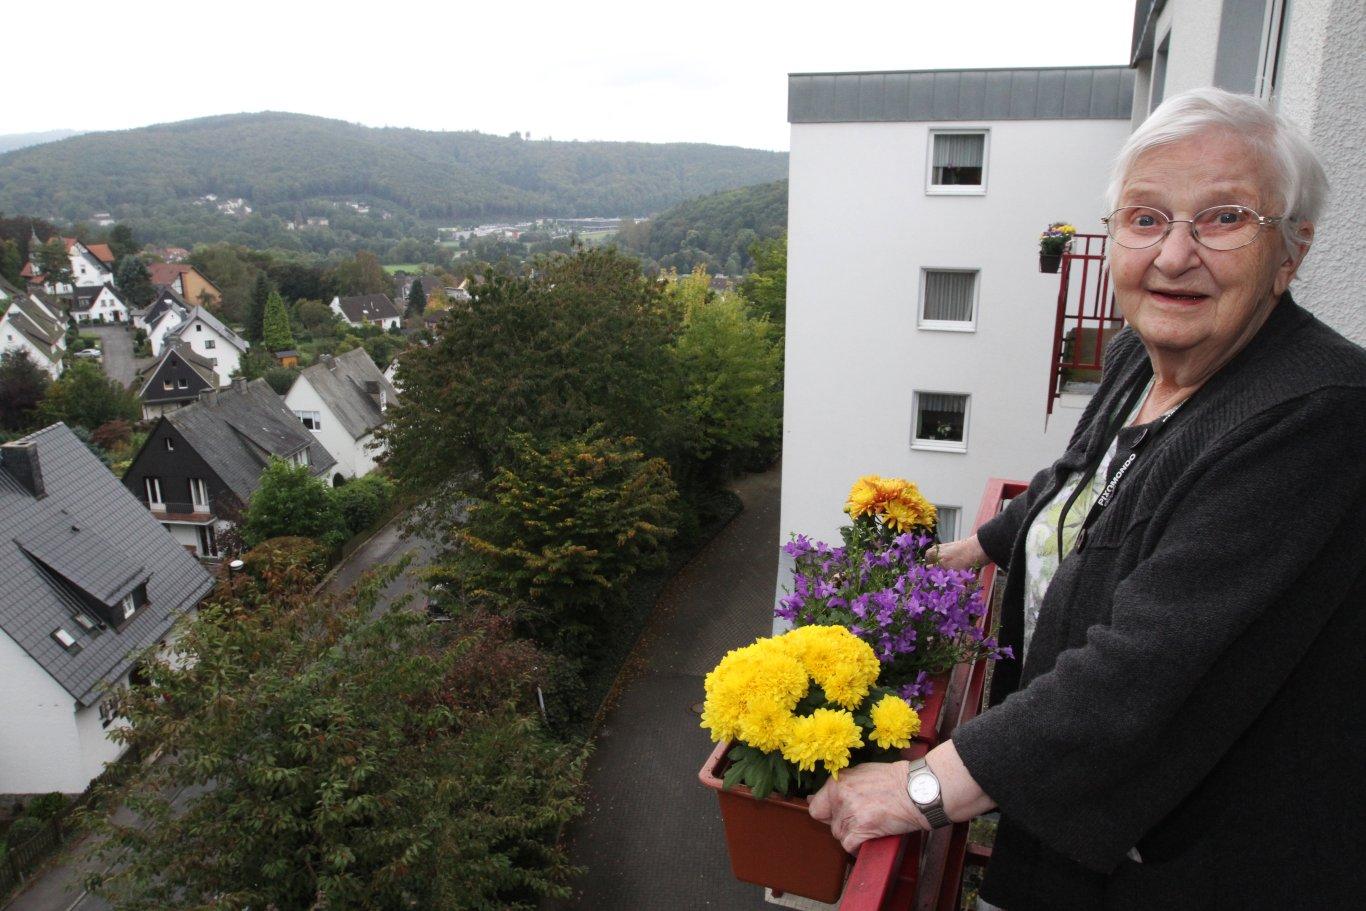 Haus zum Guten Hirten Diakonie Ruhr Hellweg e V